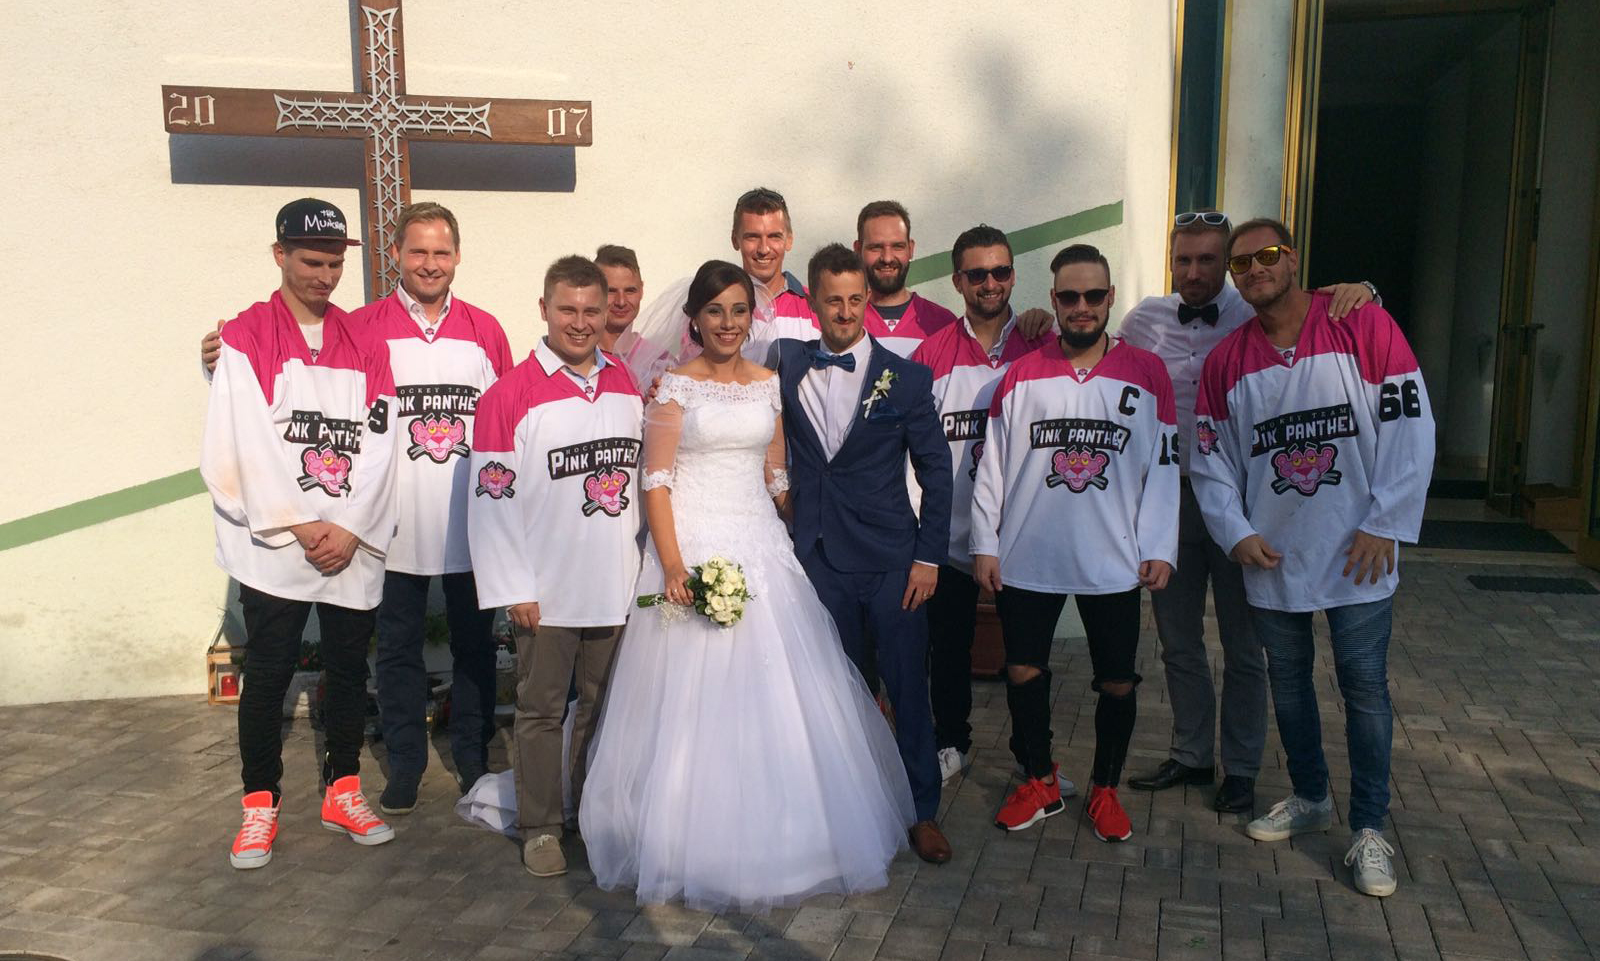 http://pinkpanther.sk/wp-content/uploads/2016/11/ciro-svadba-2.jpg